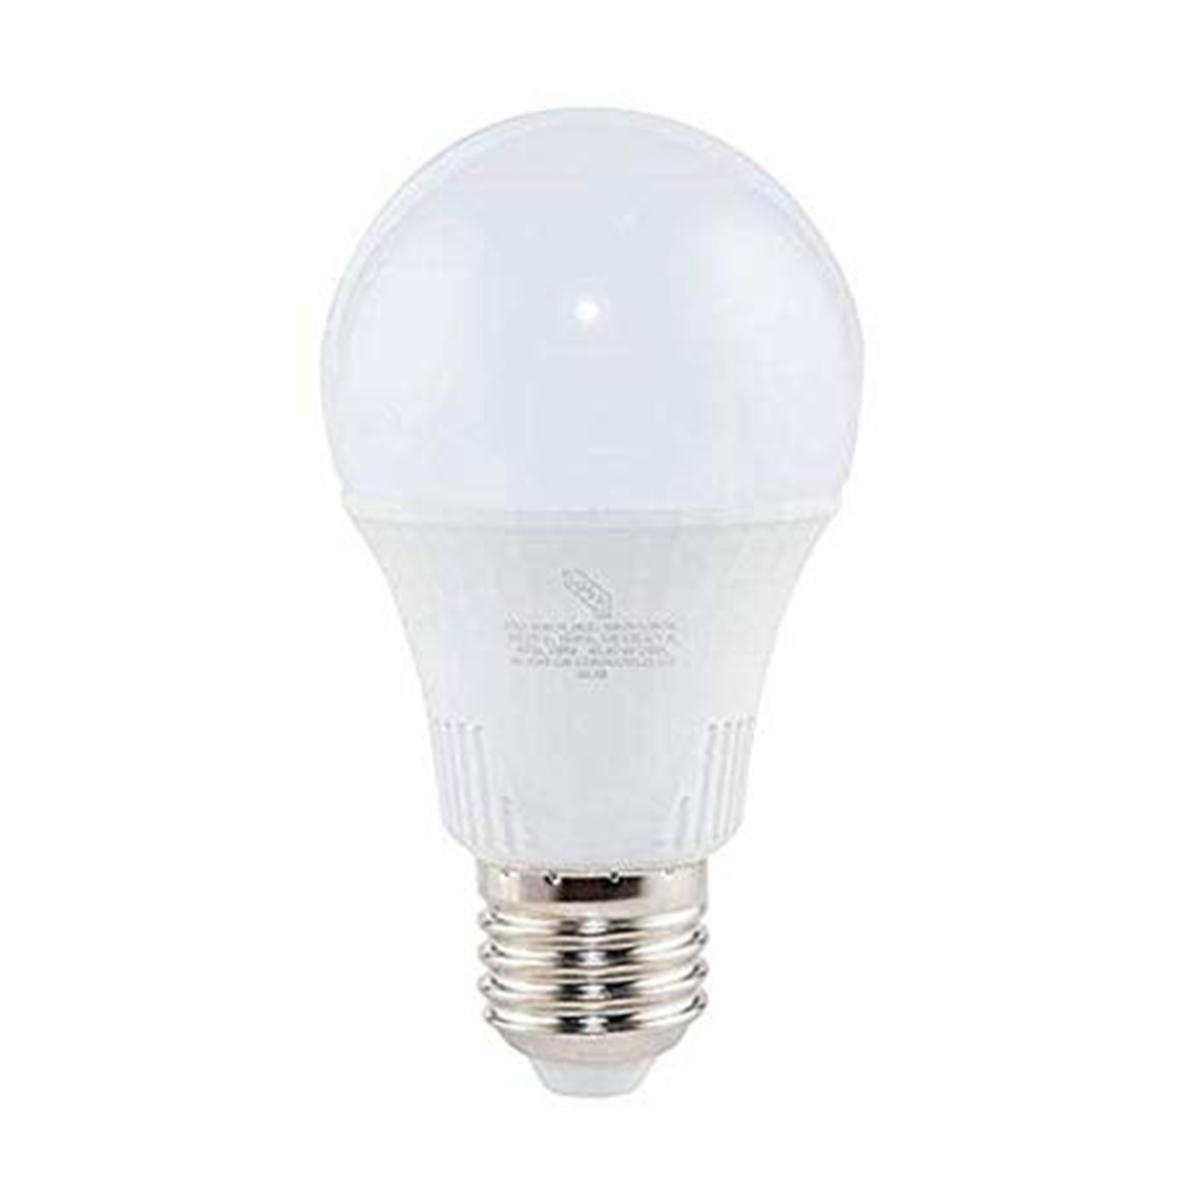 Foco Lampara Led Luz Blanca A19 9W Equivale 60 W 618312 Iusa